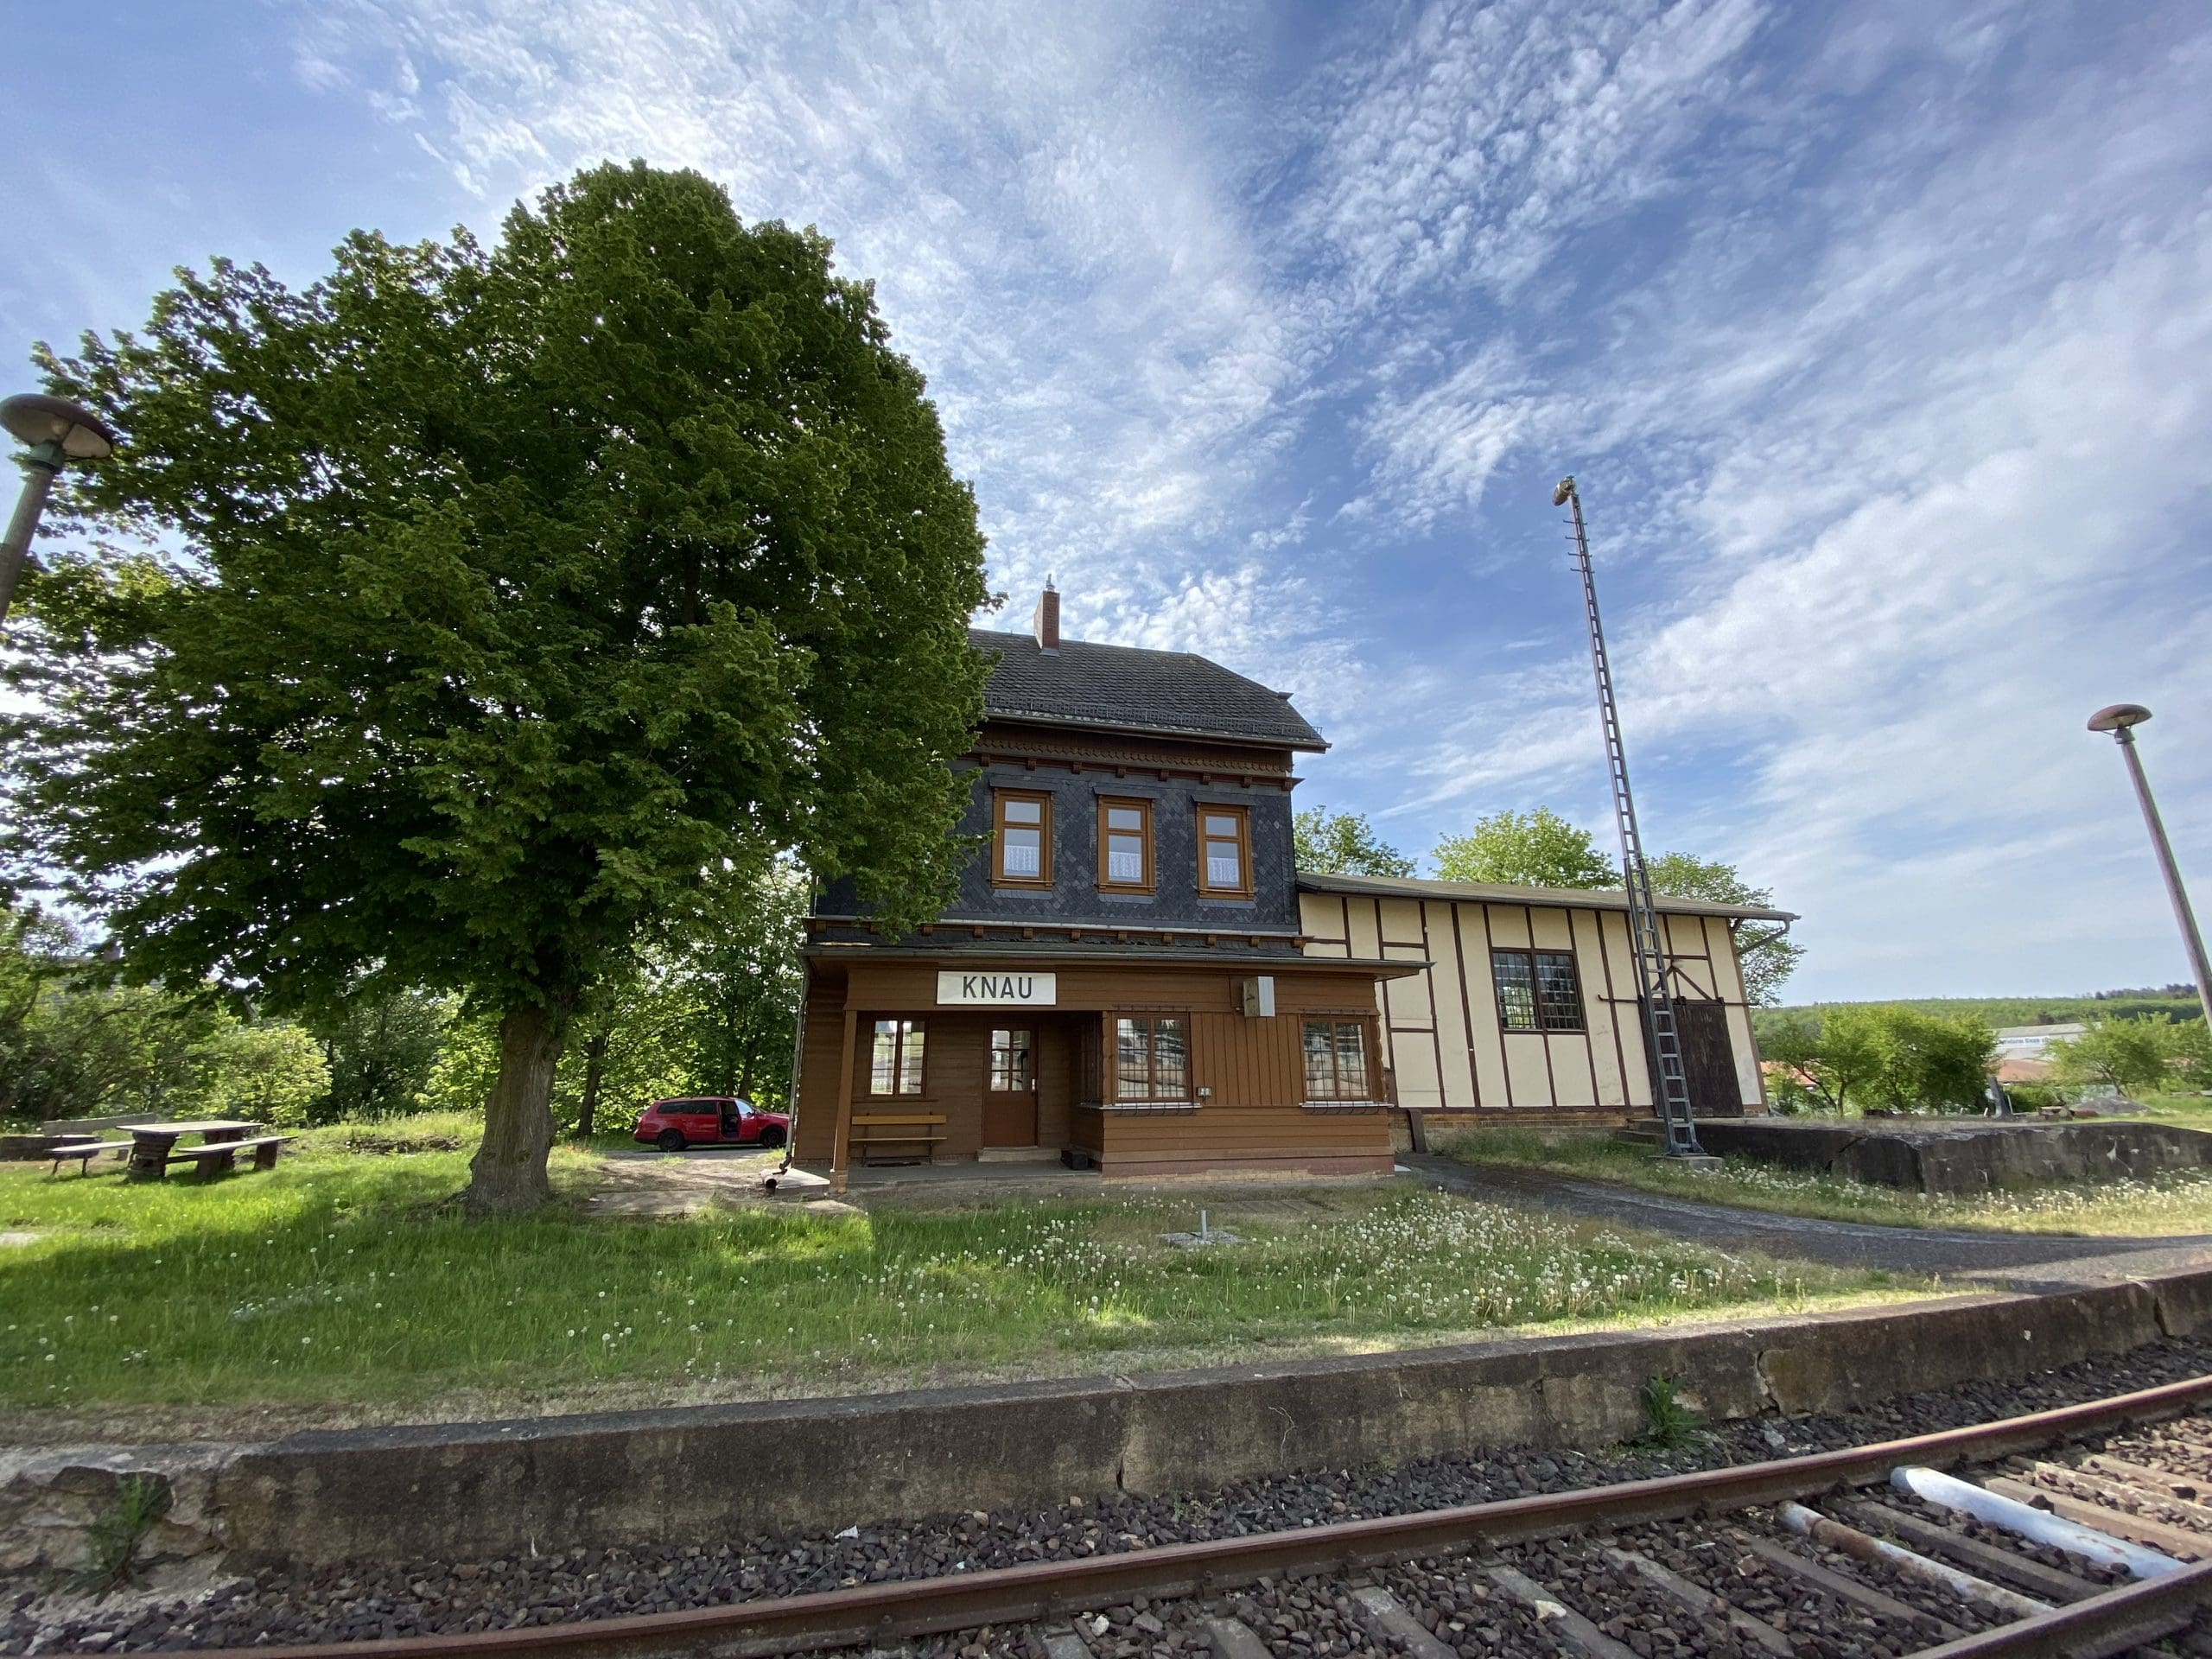 ©Foto: Jan Krehl | railmen | Historischer Bahnhof Knau